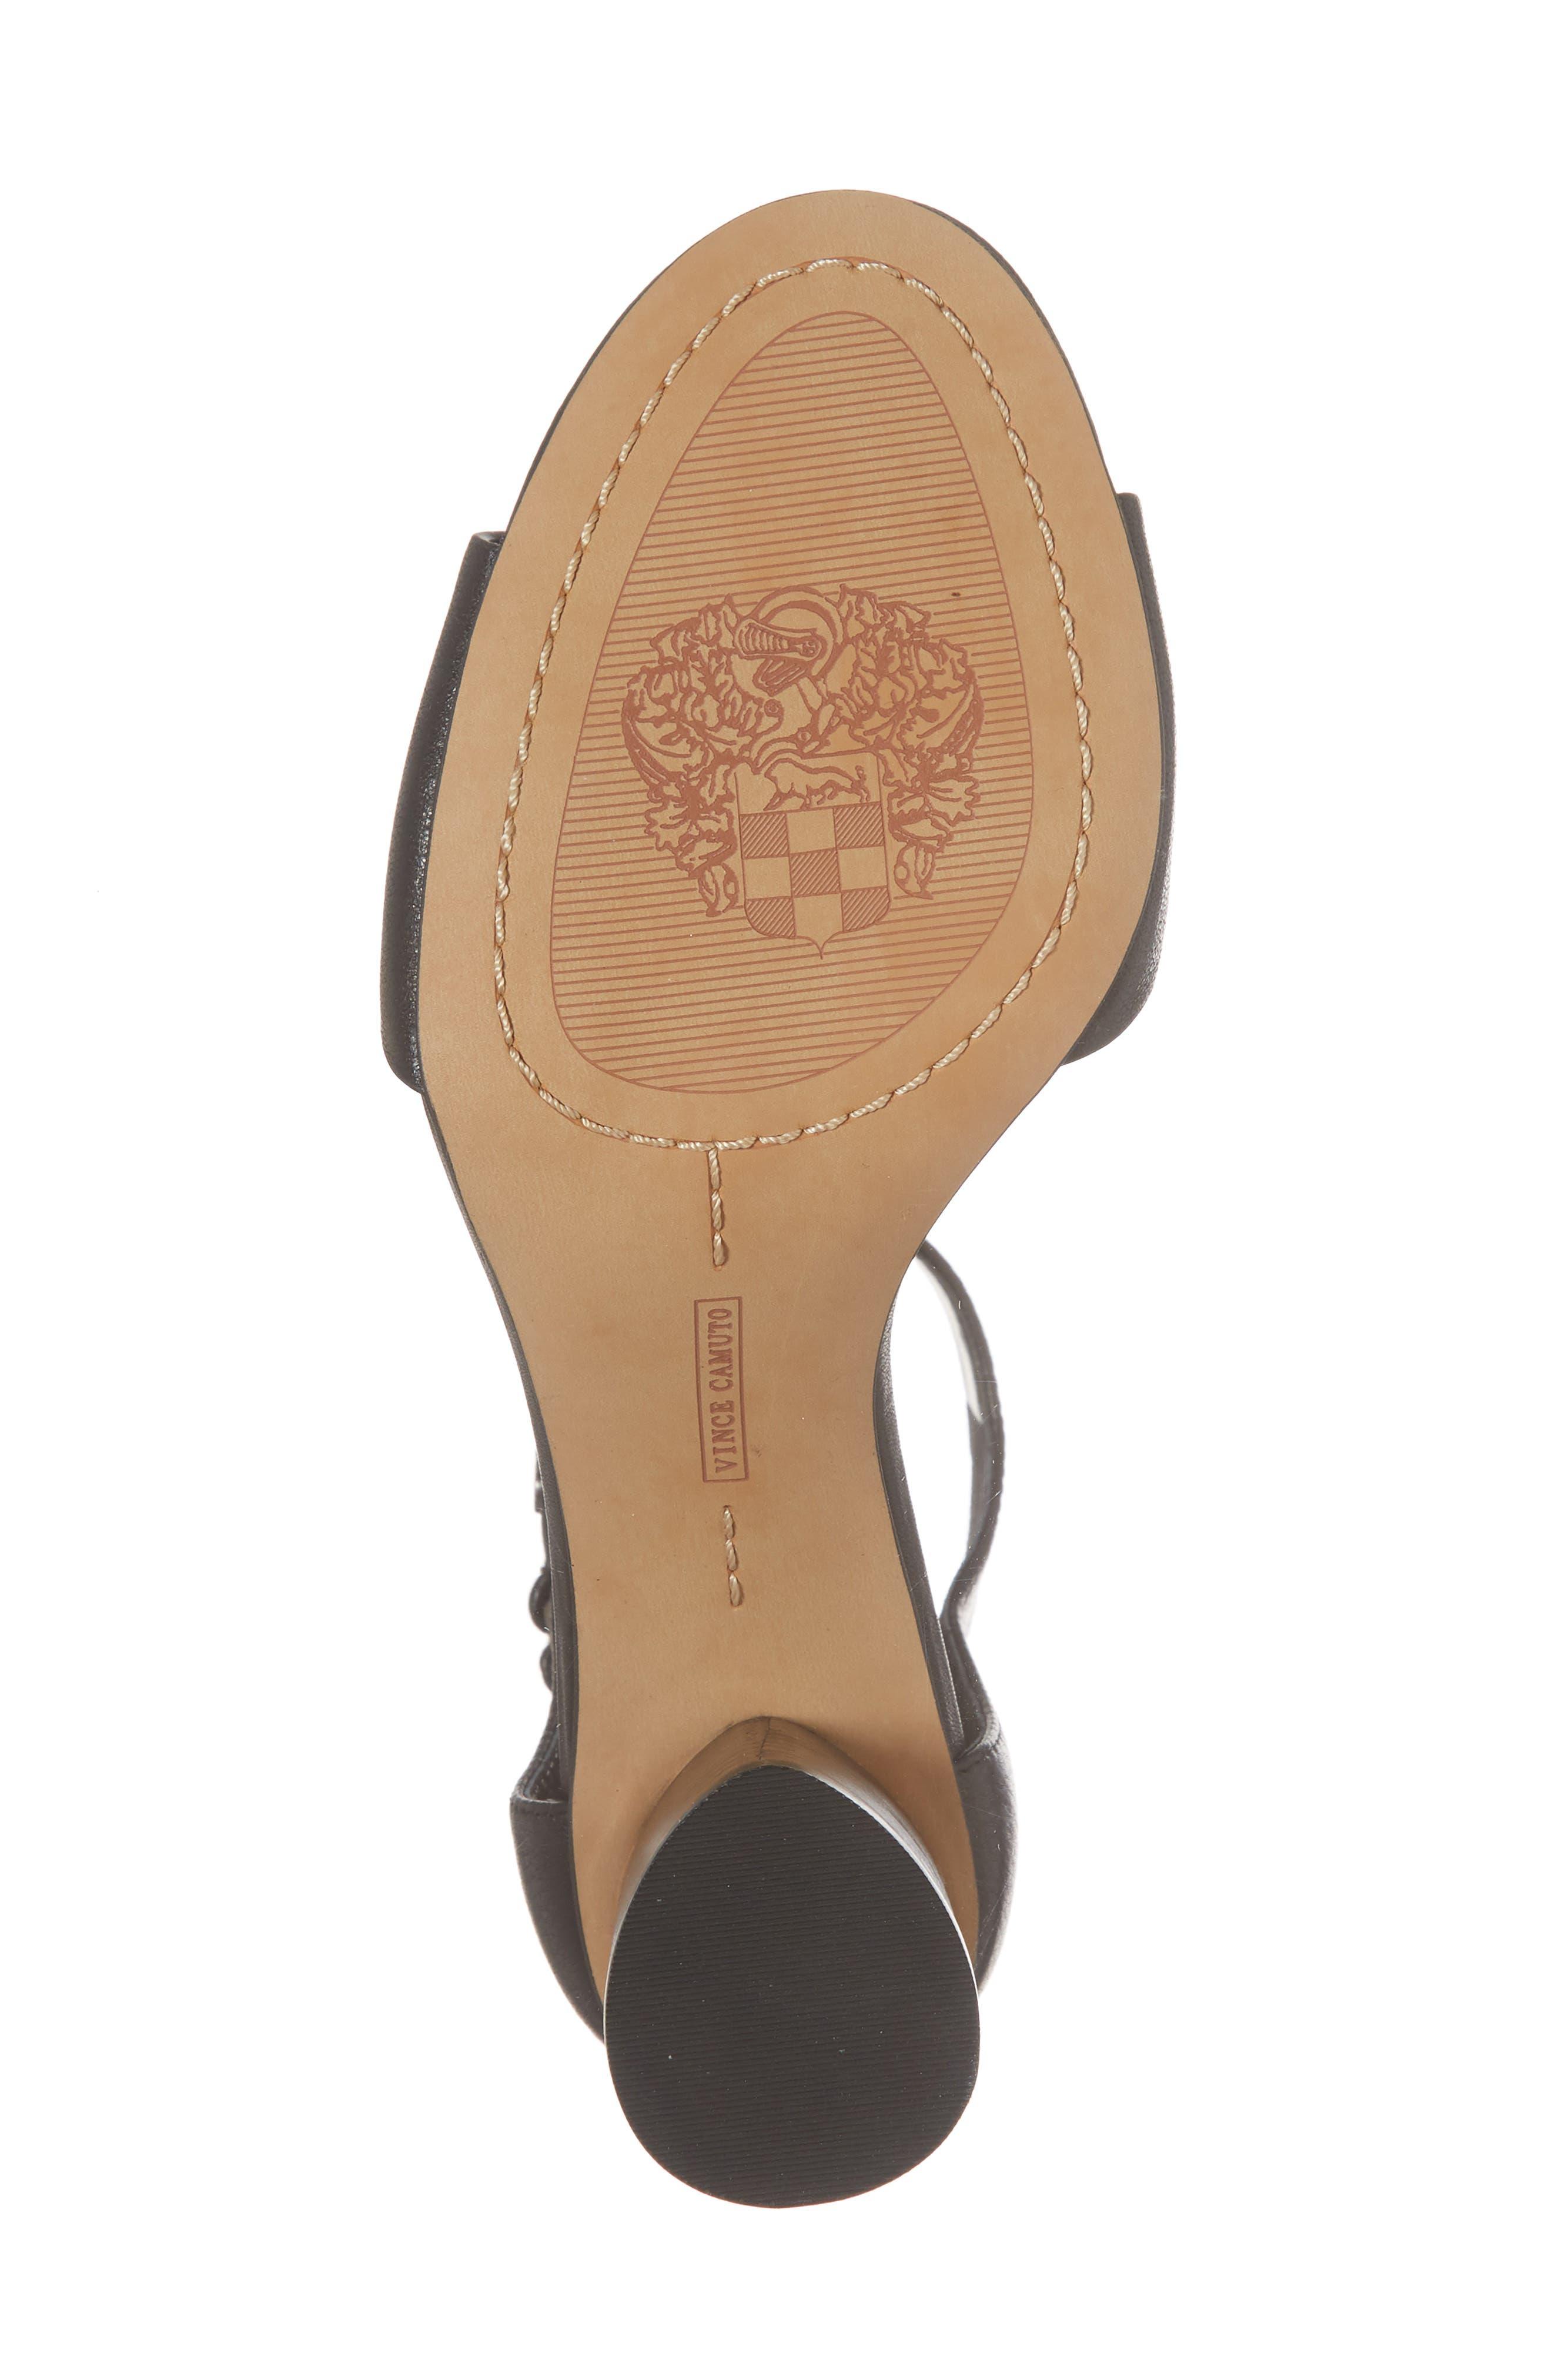 Jannali Ankle Strap Sandal,                             Alternate thumbnail 6, color,                             BLACK LEATHER